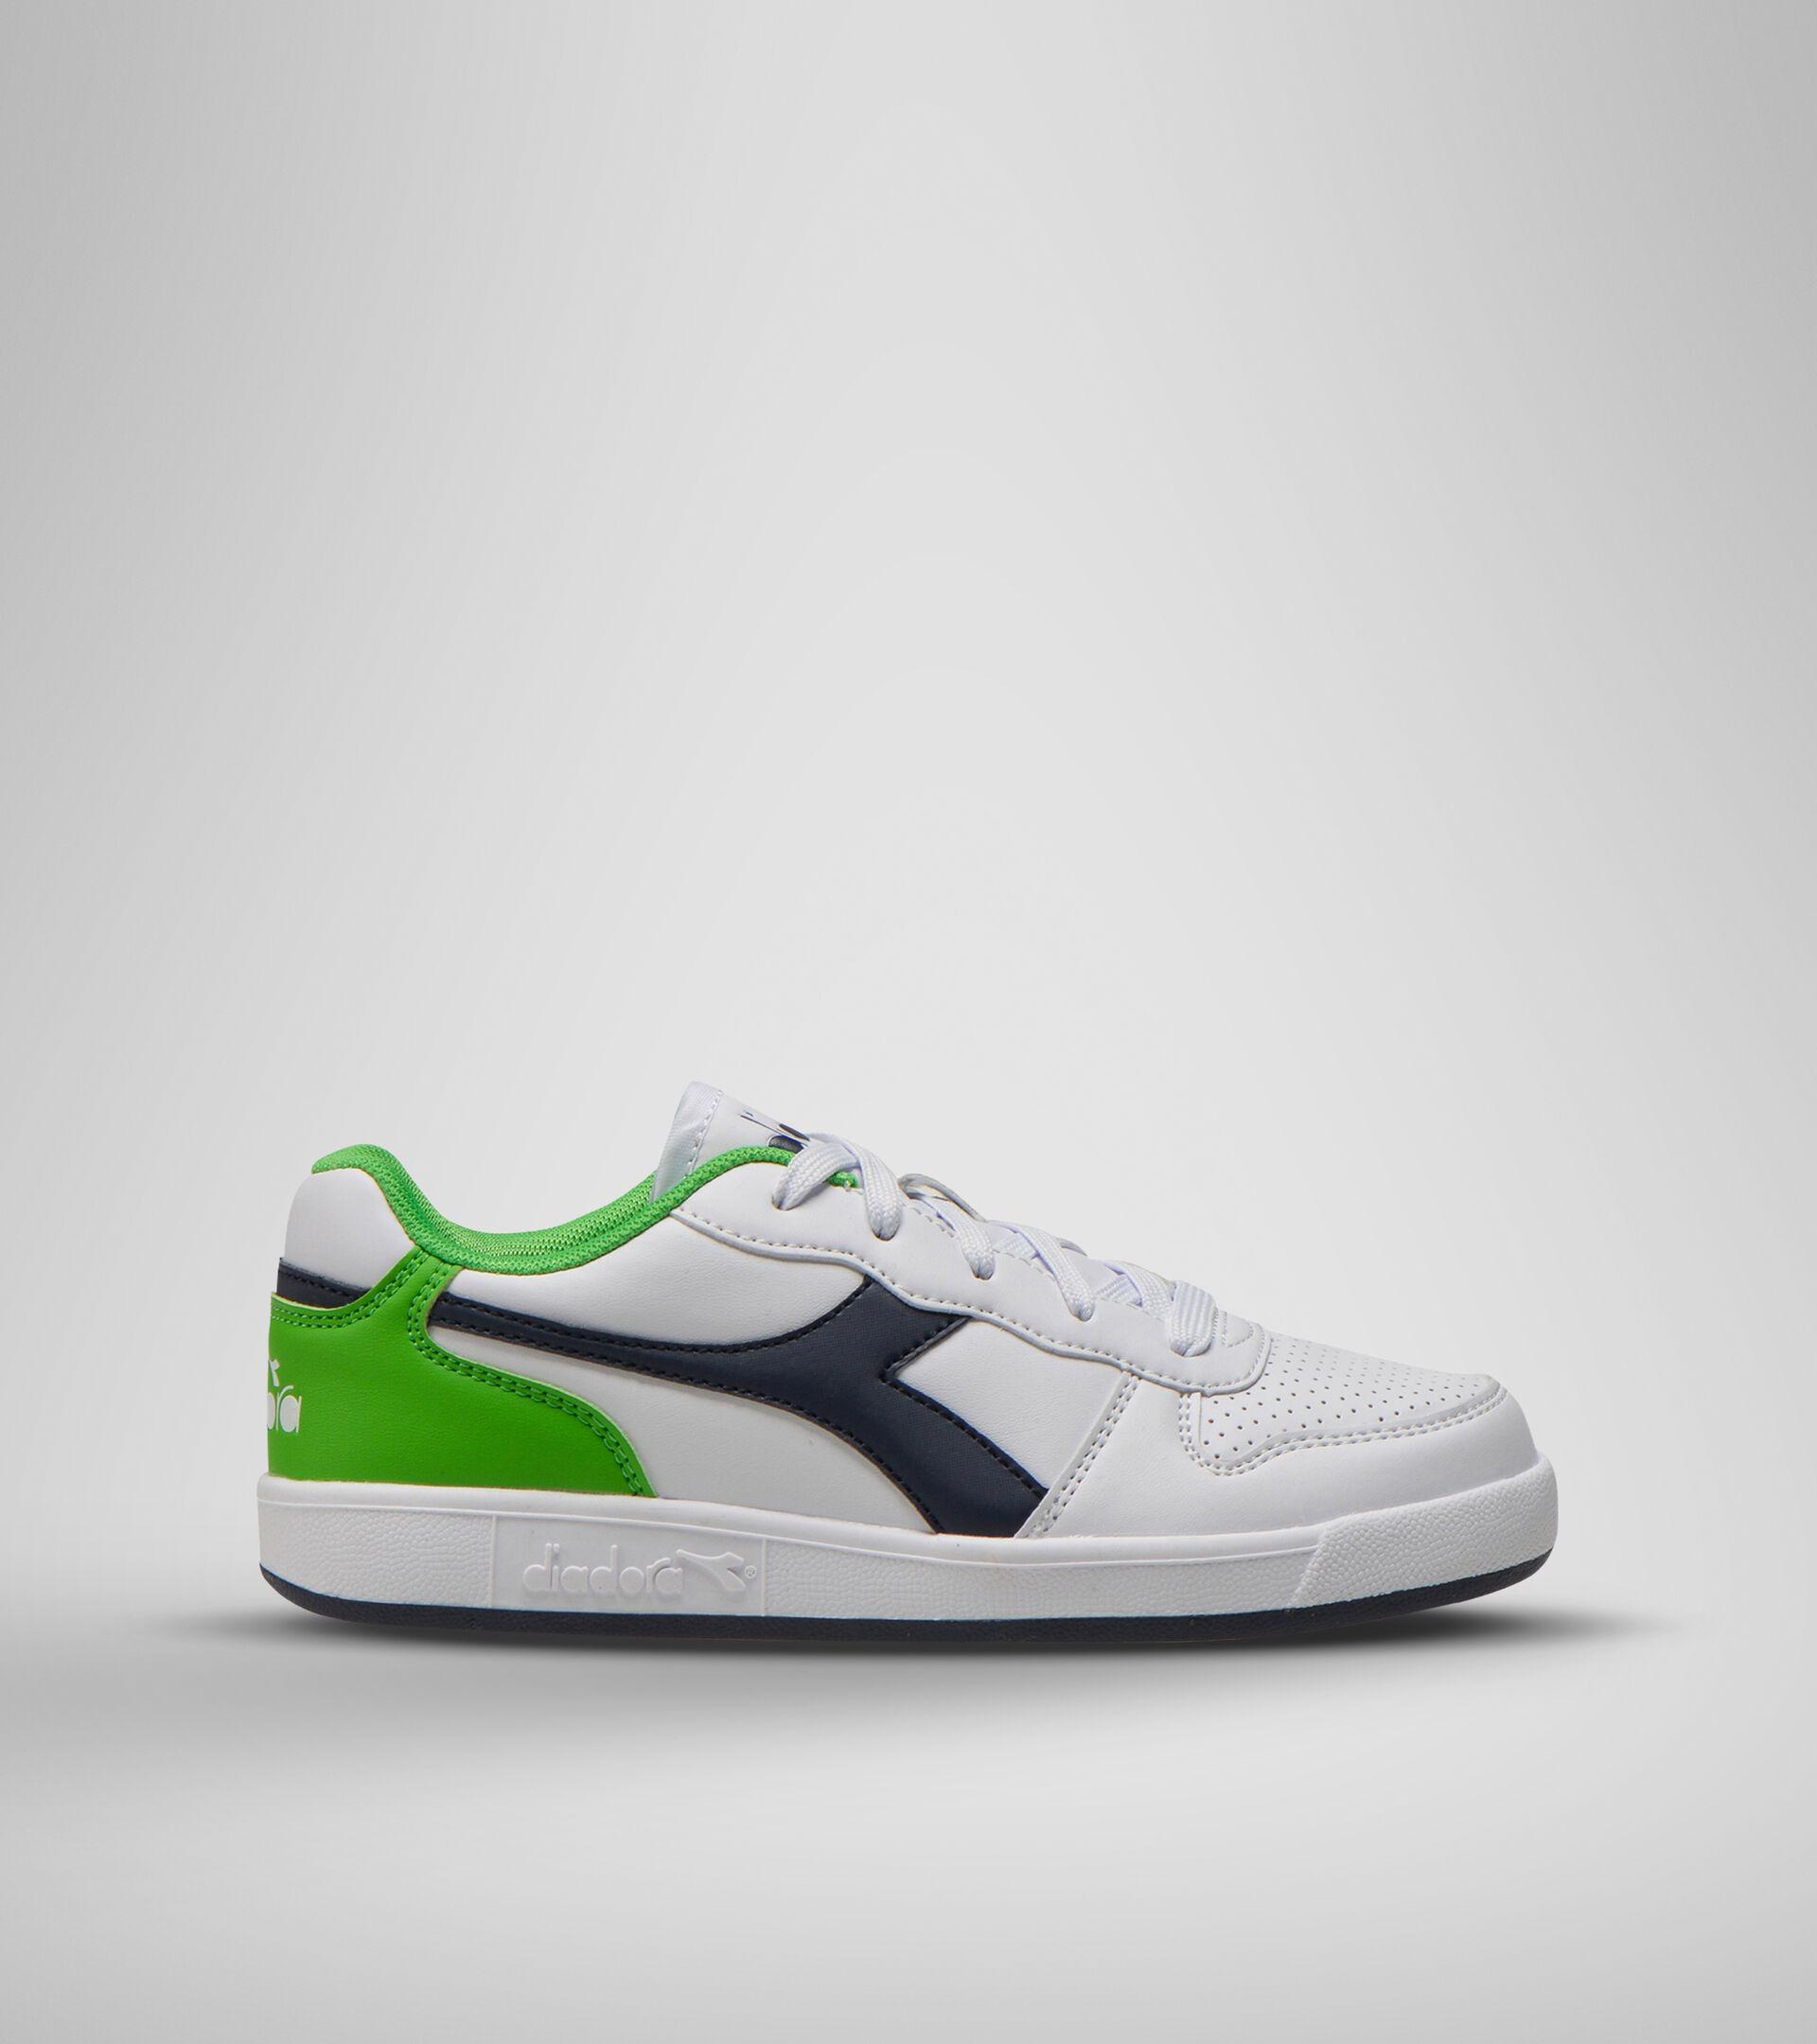 Footwear Sport BAMBINO PLAYGROUND GS BCO/BLU CORSARO/VERDE EVIDENZI Diadora